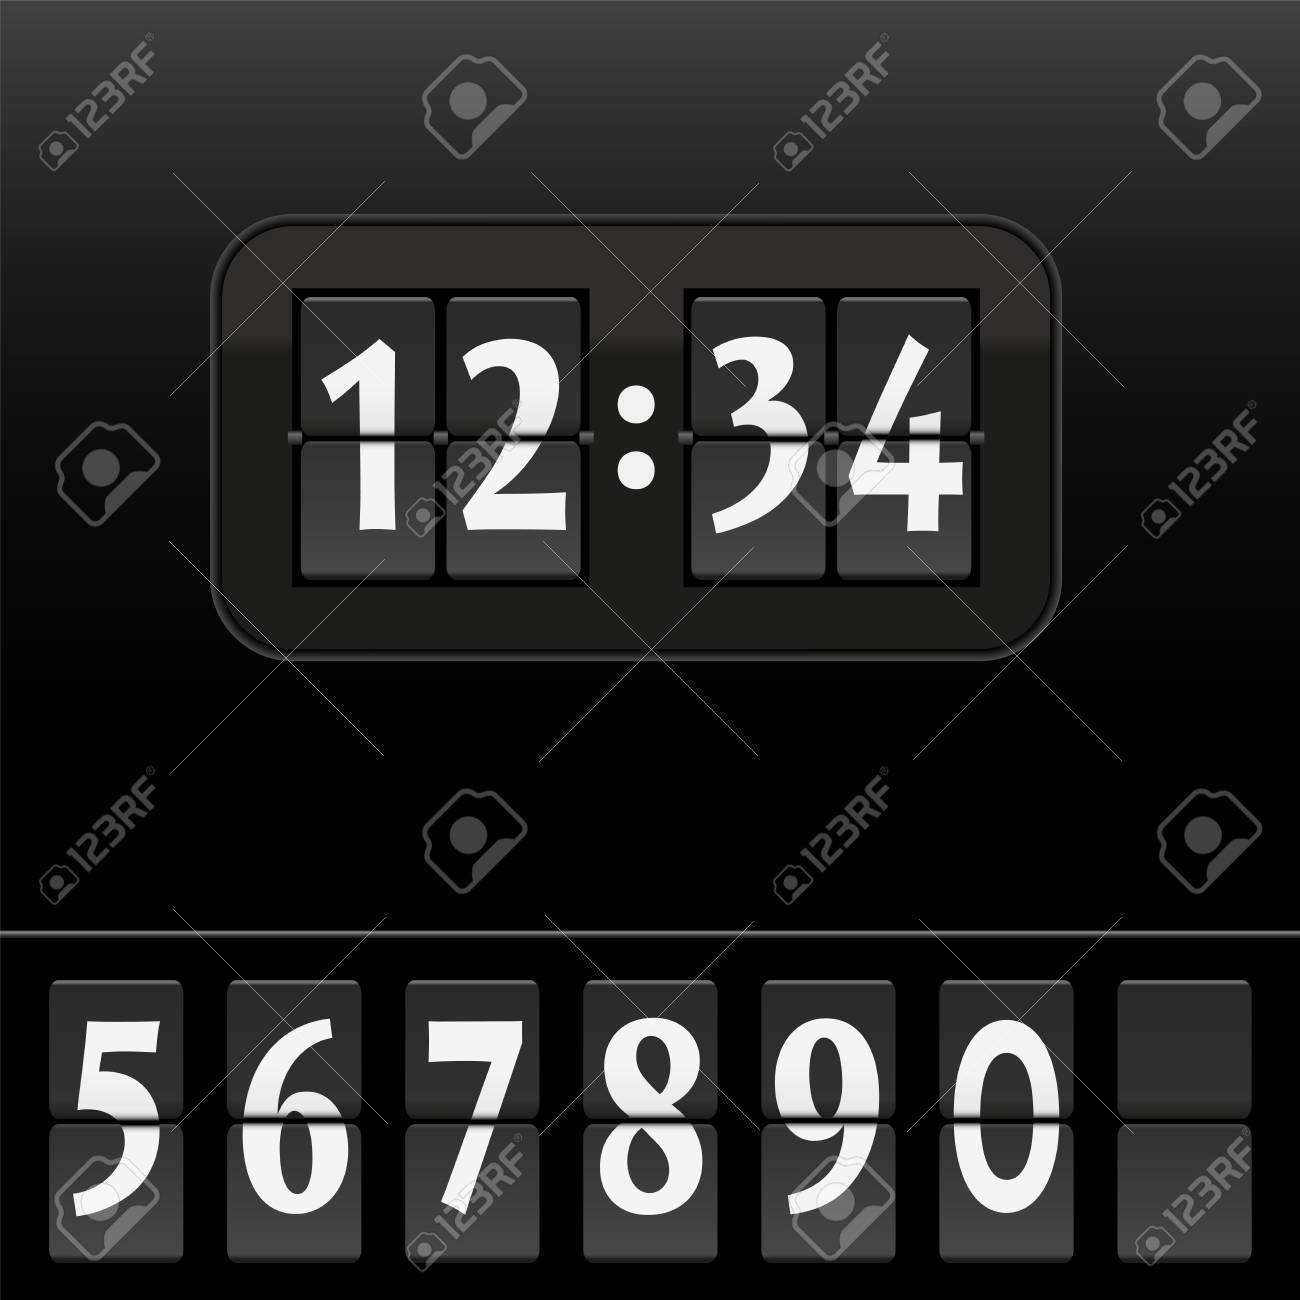 digital clockface - Isken kaptanband co